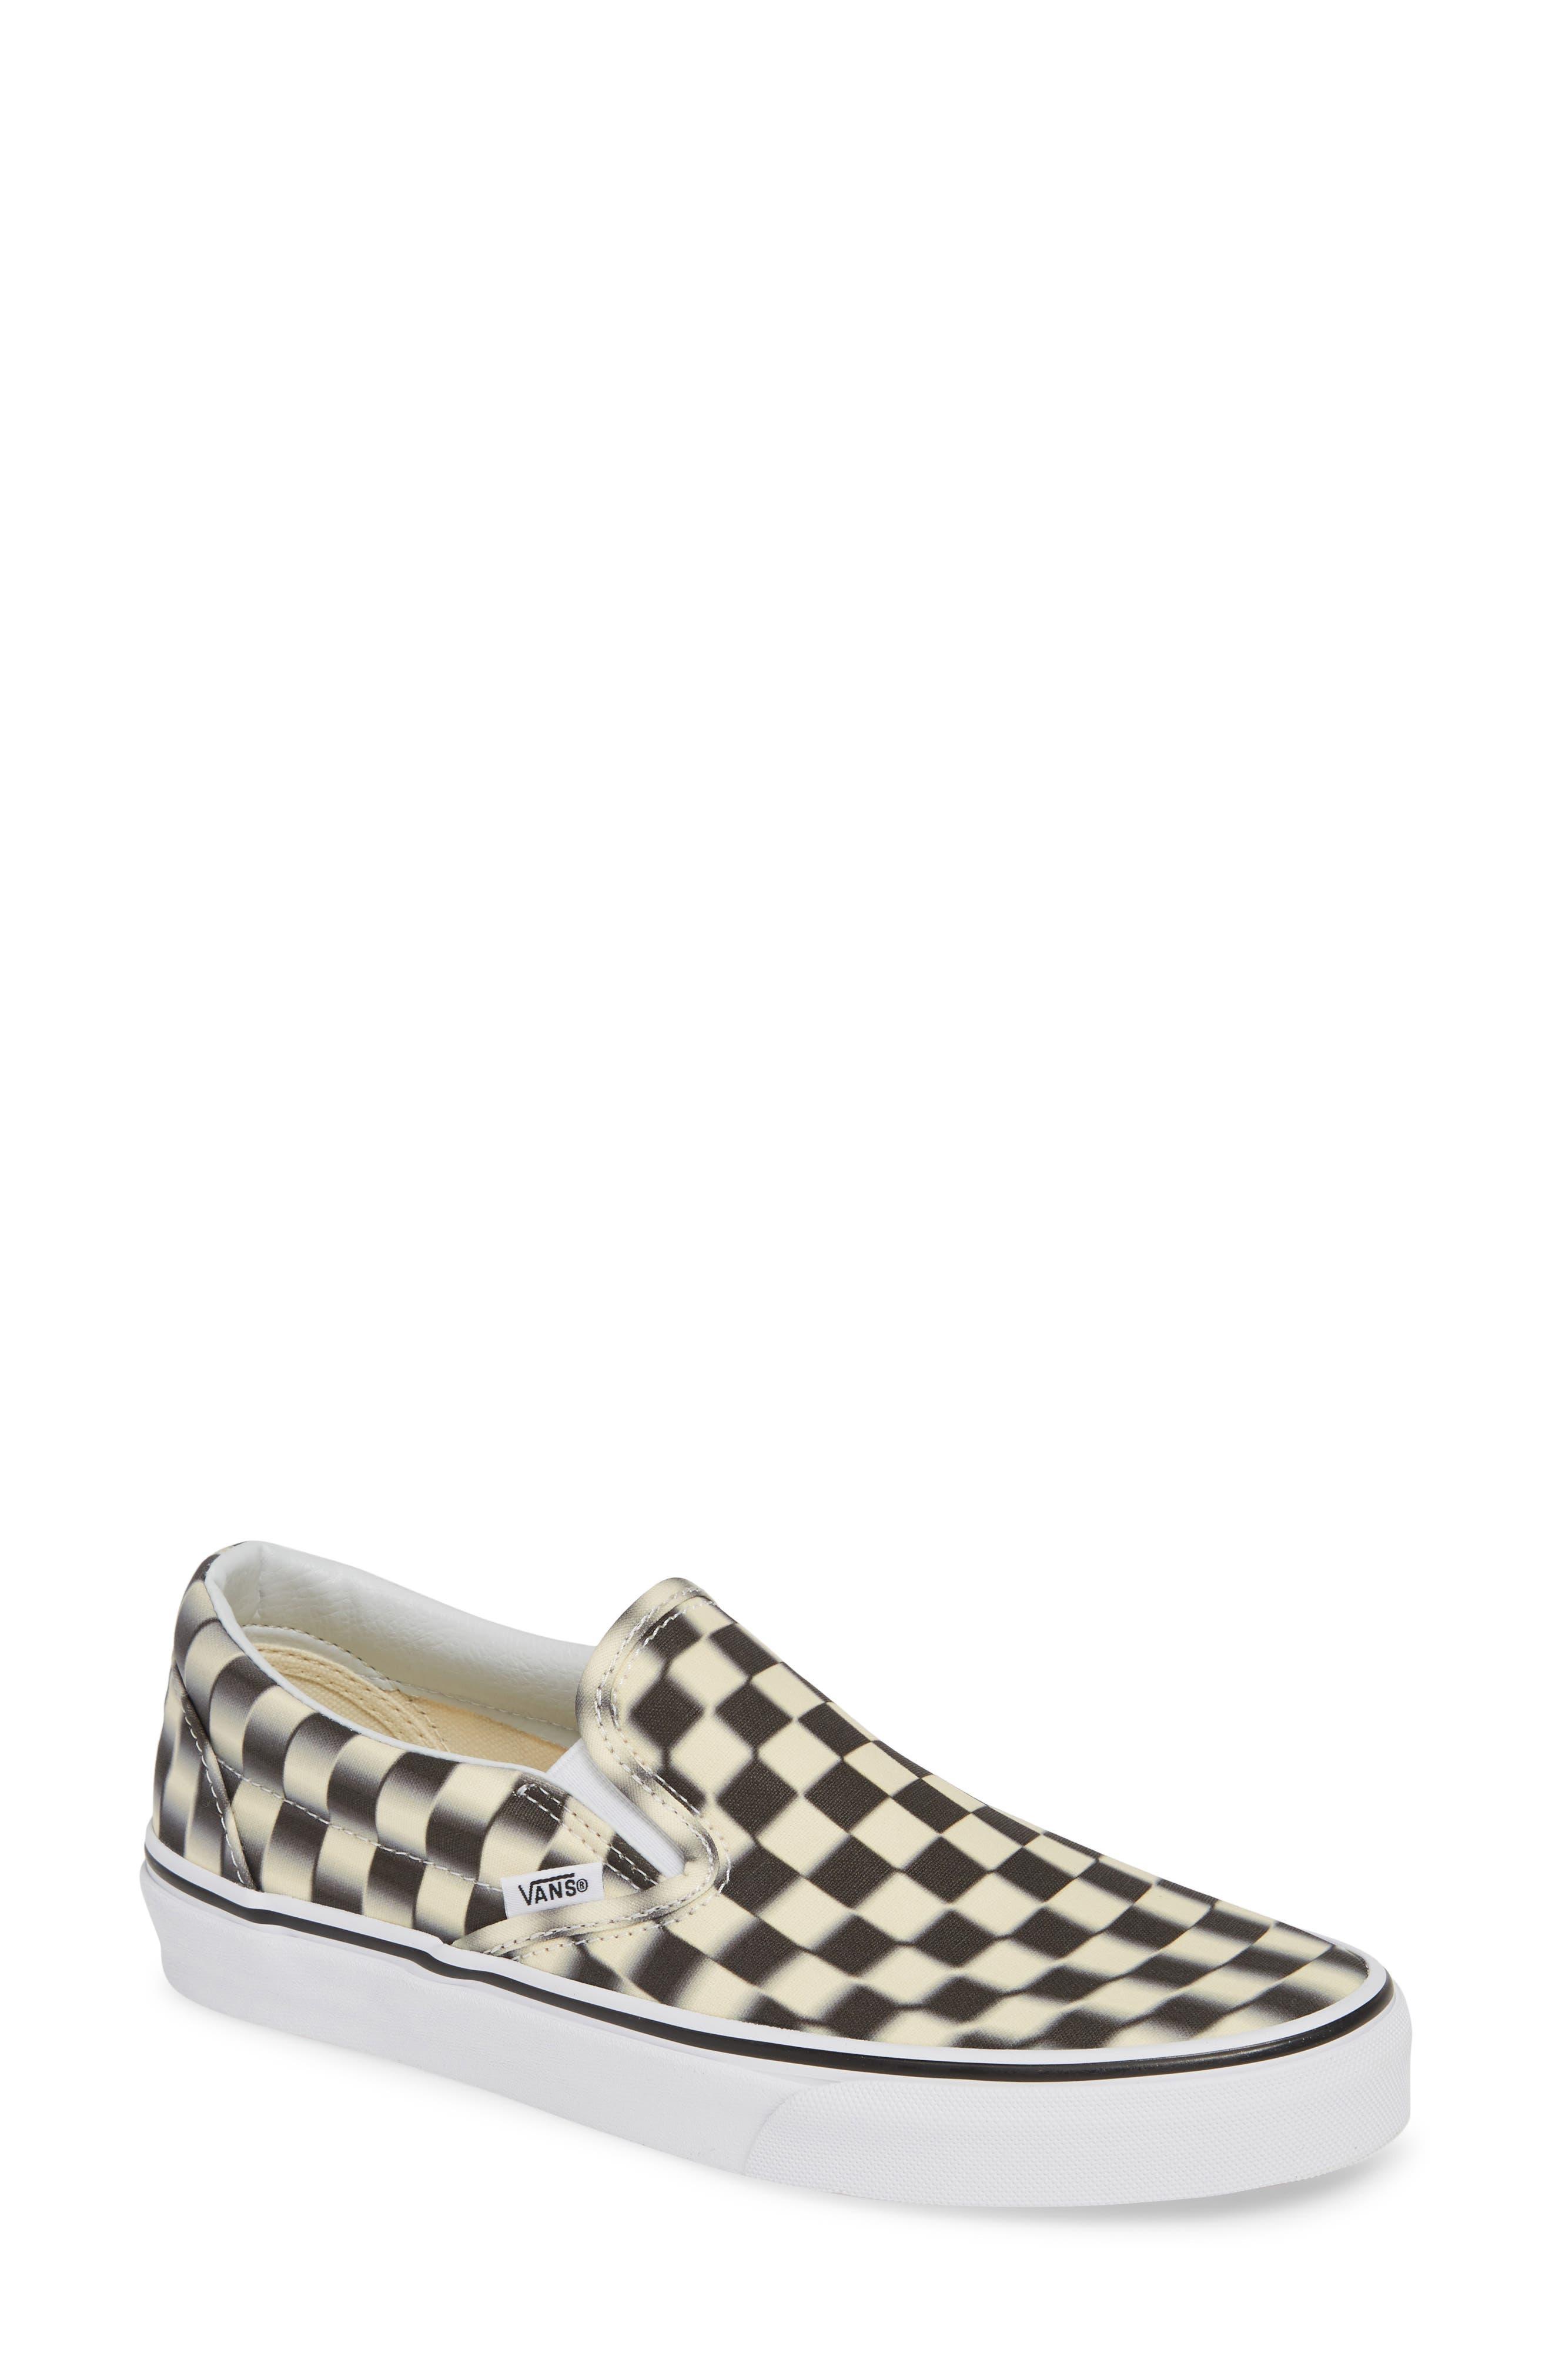 VANS Classic Slip-On Sneaker, Main, color, 011